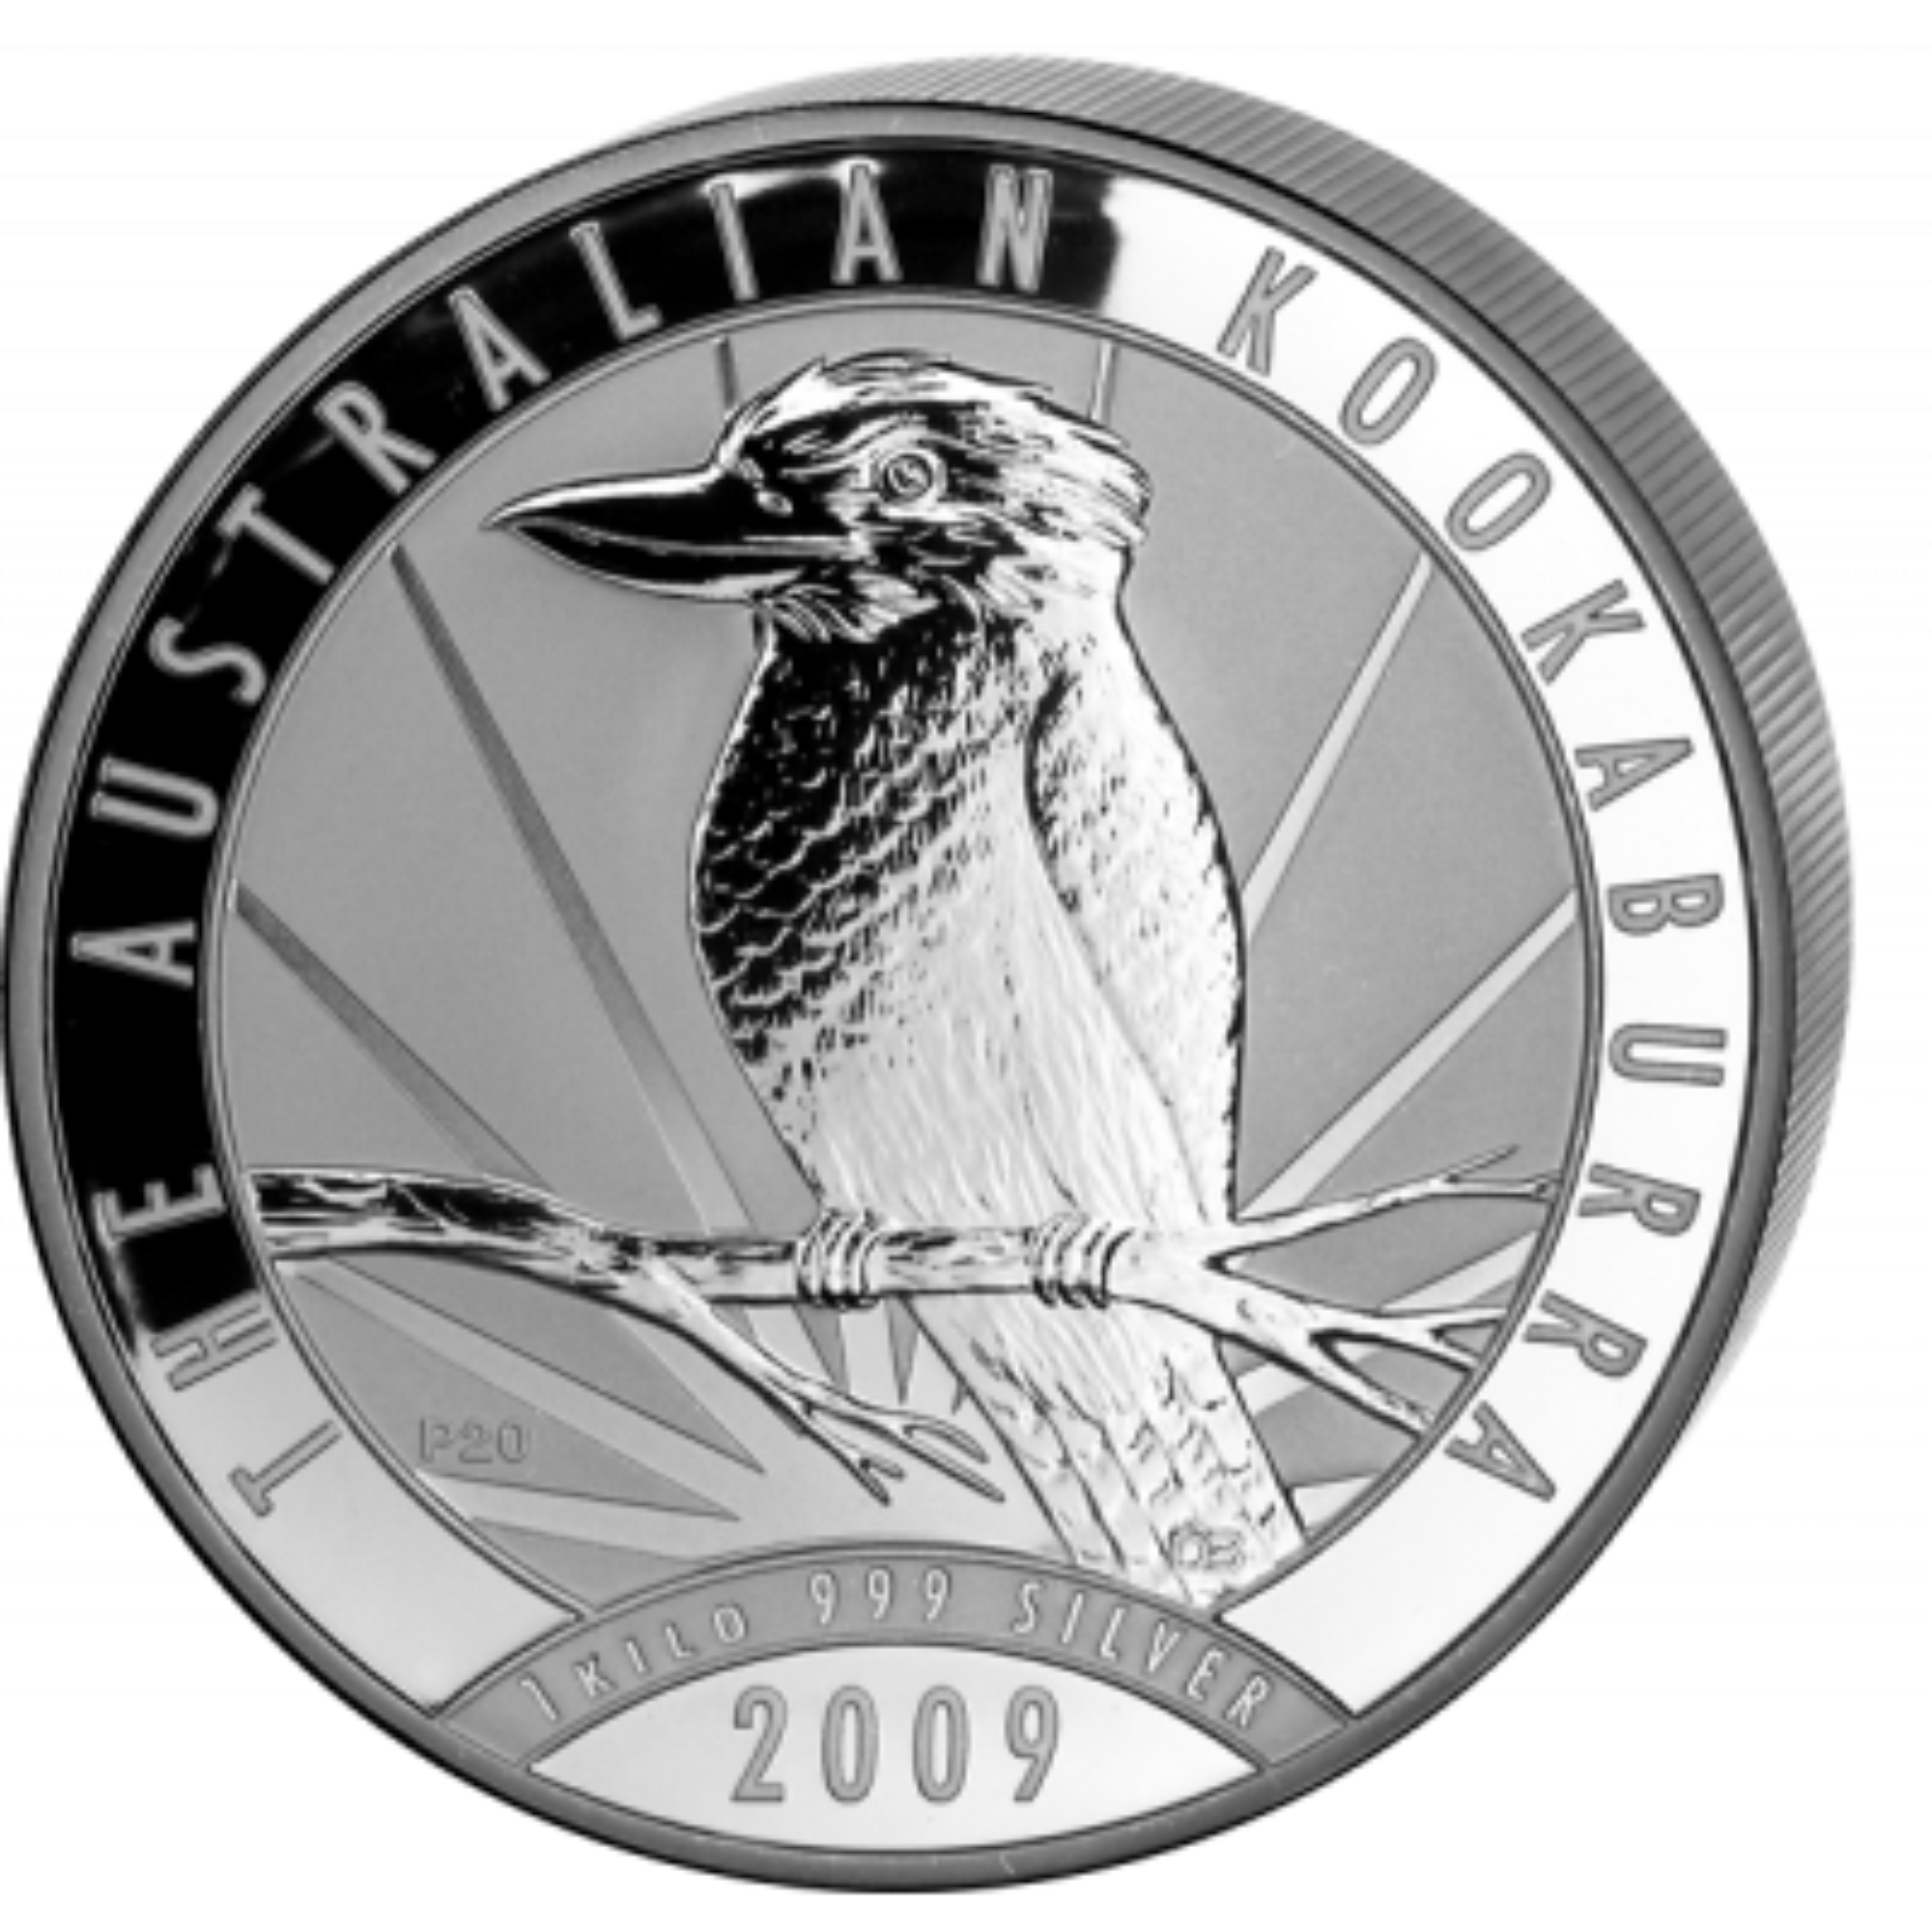 2009 kilo kookaburra munt